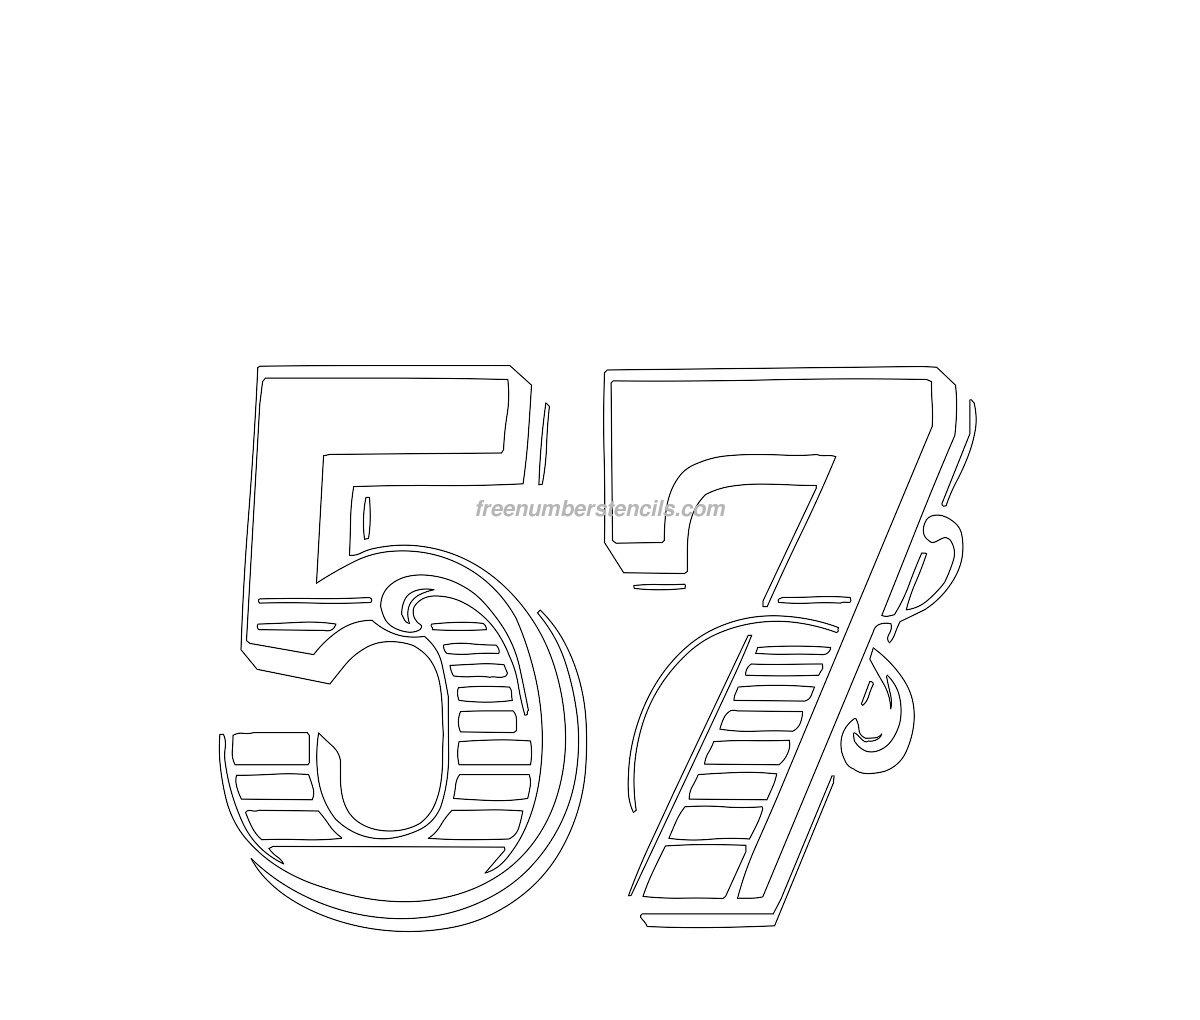 Free Decorative 57 Number Stencil Freenumberstencils Com